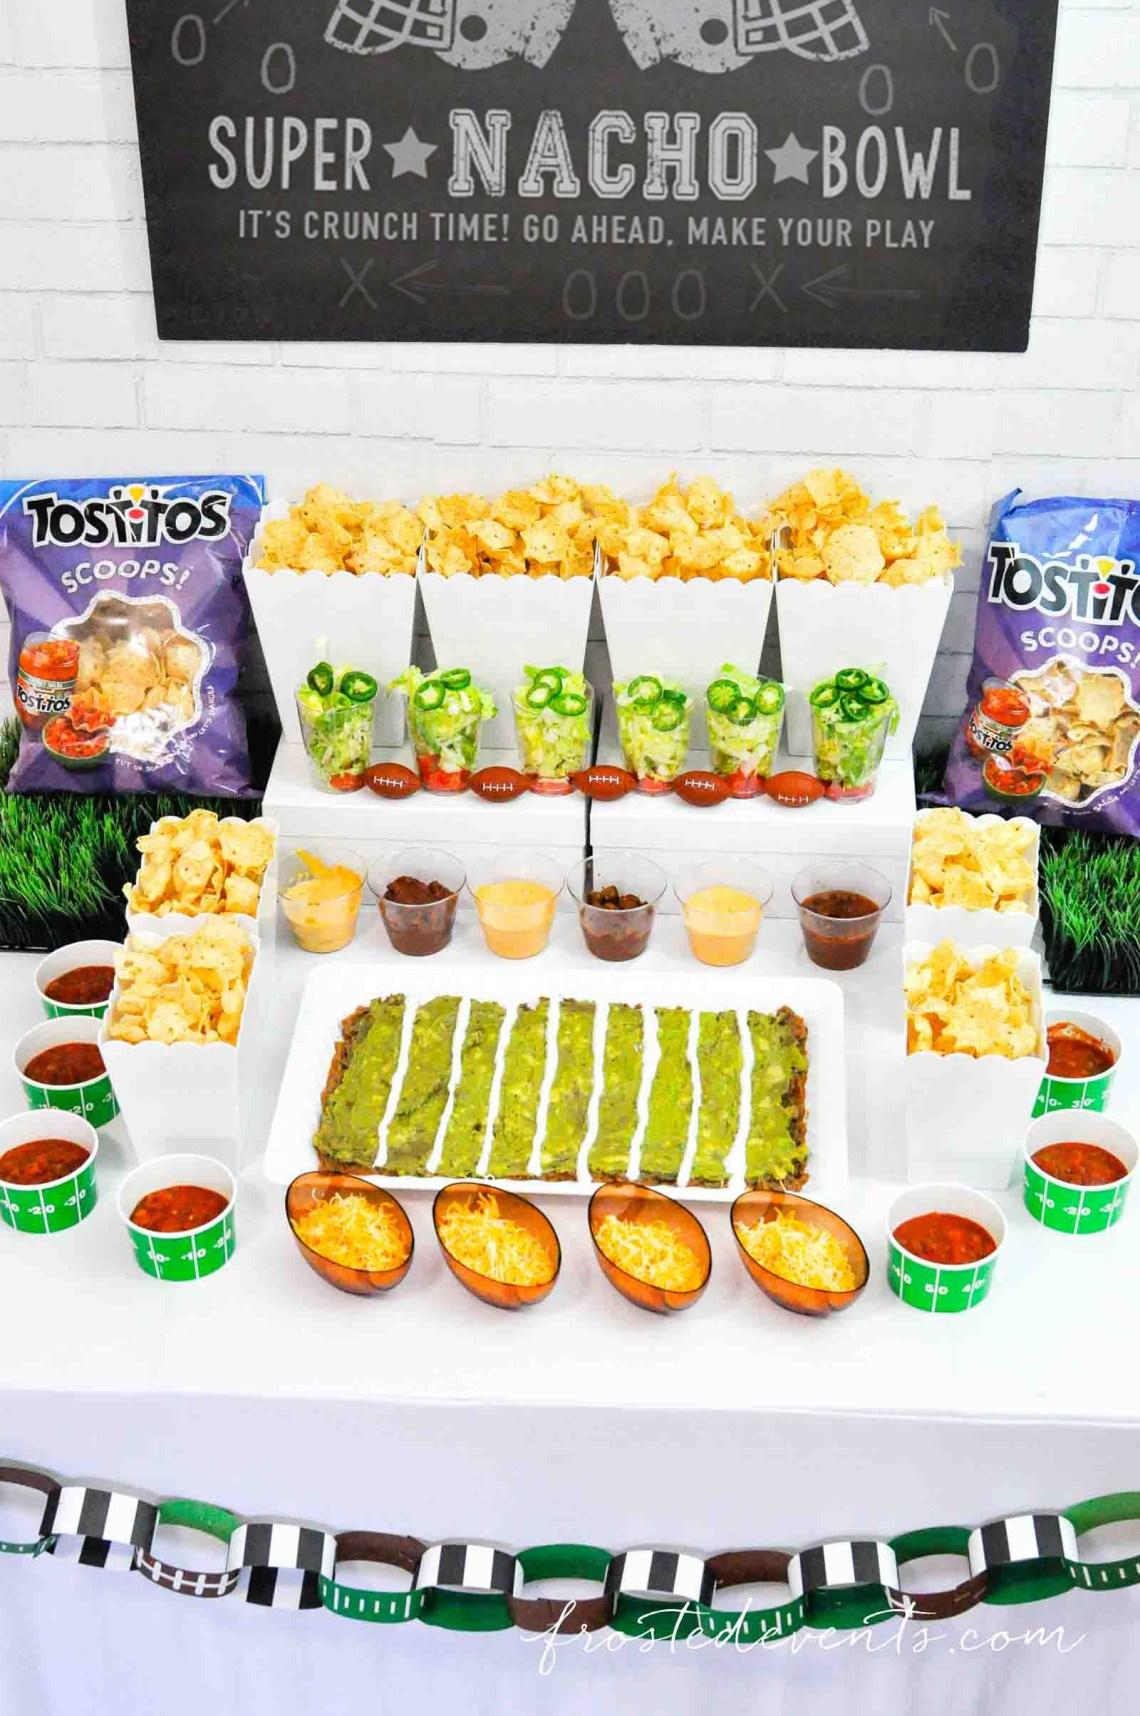 Football Party Ideas - Football party food Super Bowl Nacho Bar with Tostitos Food Ideas